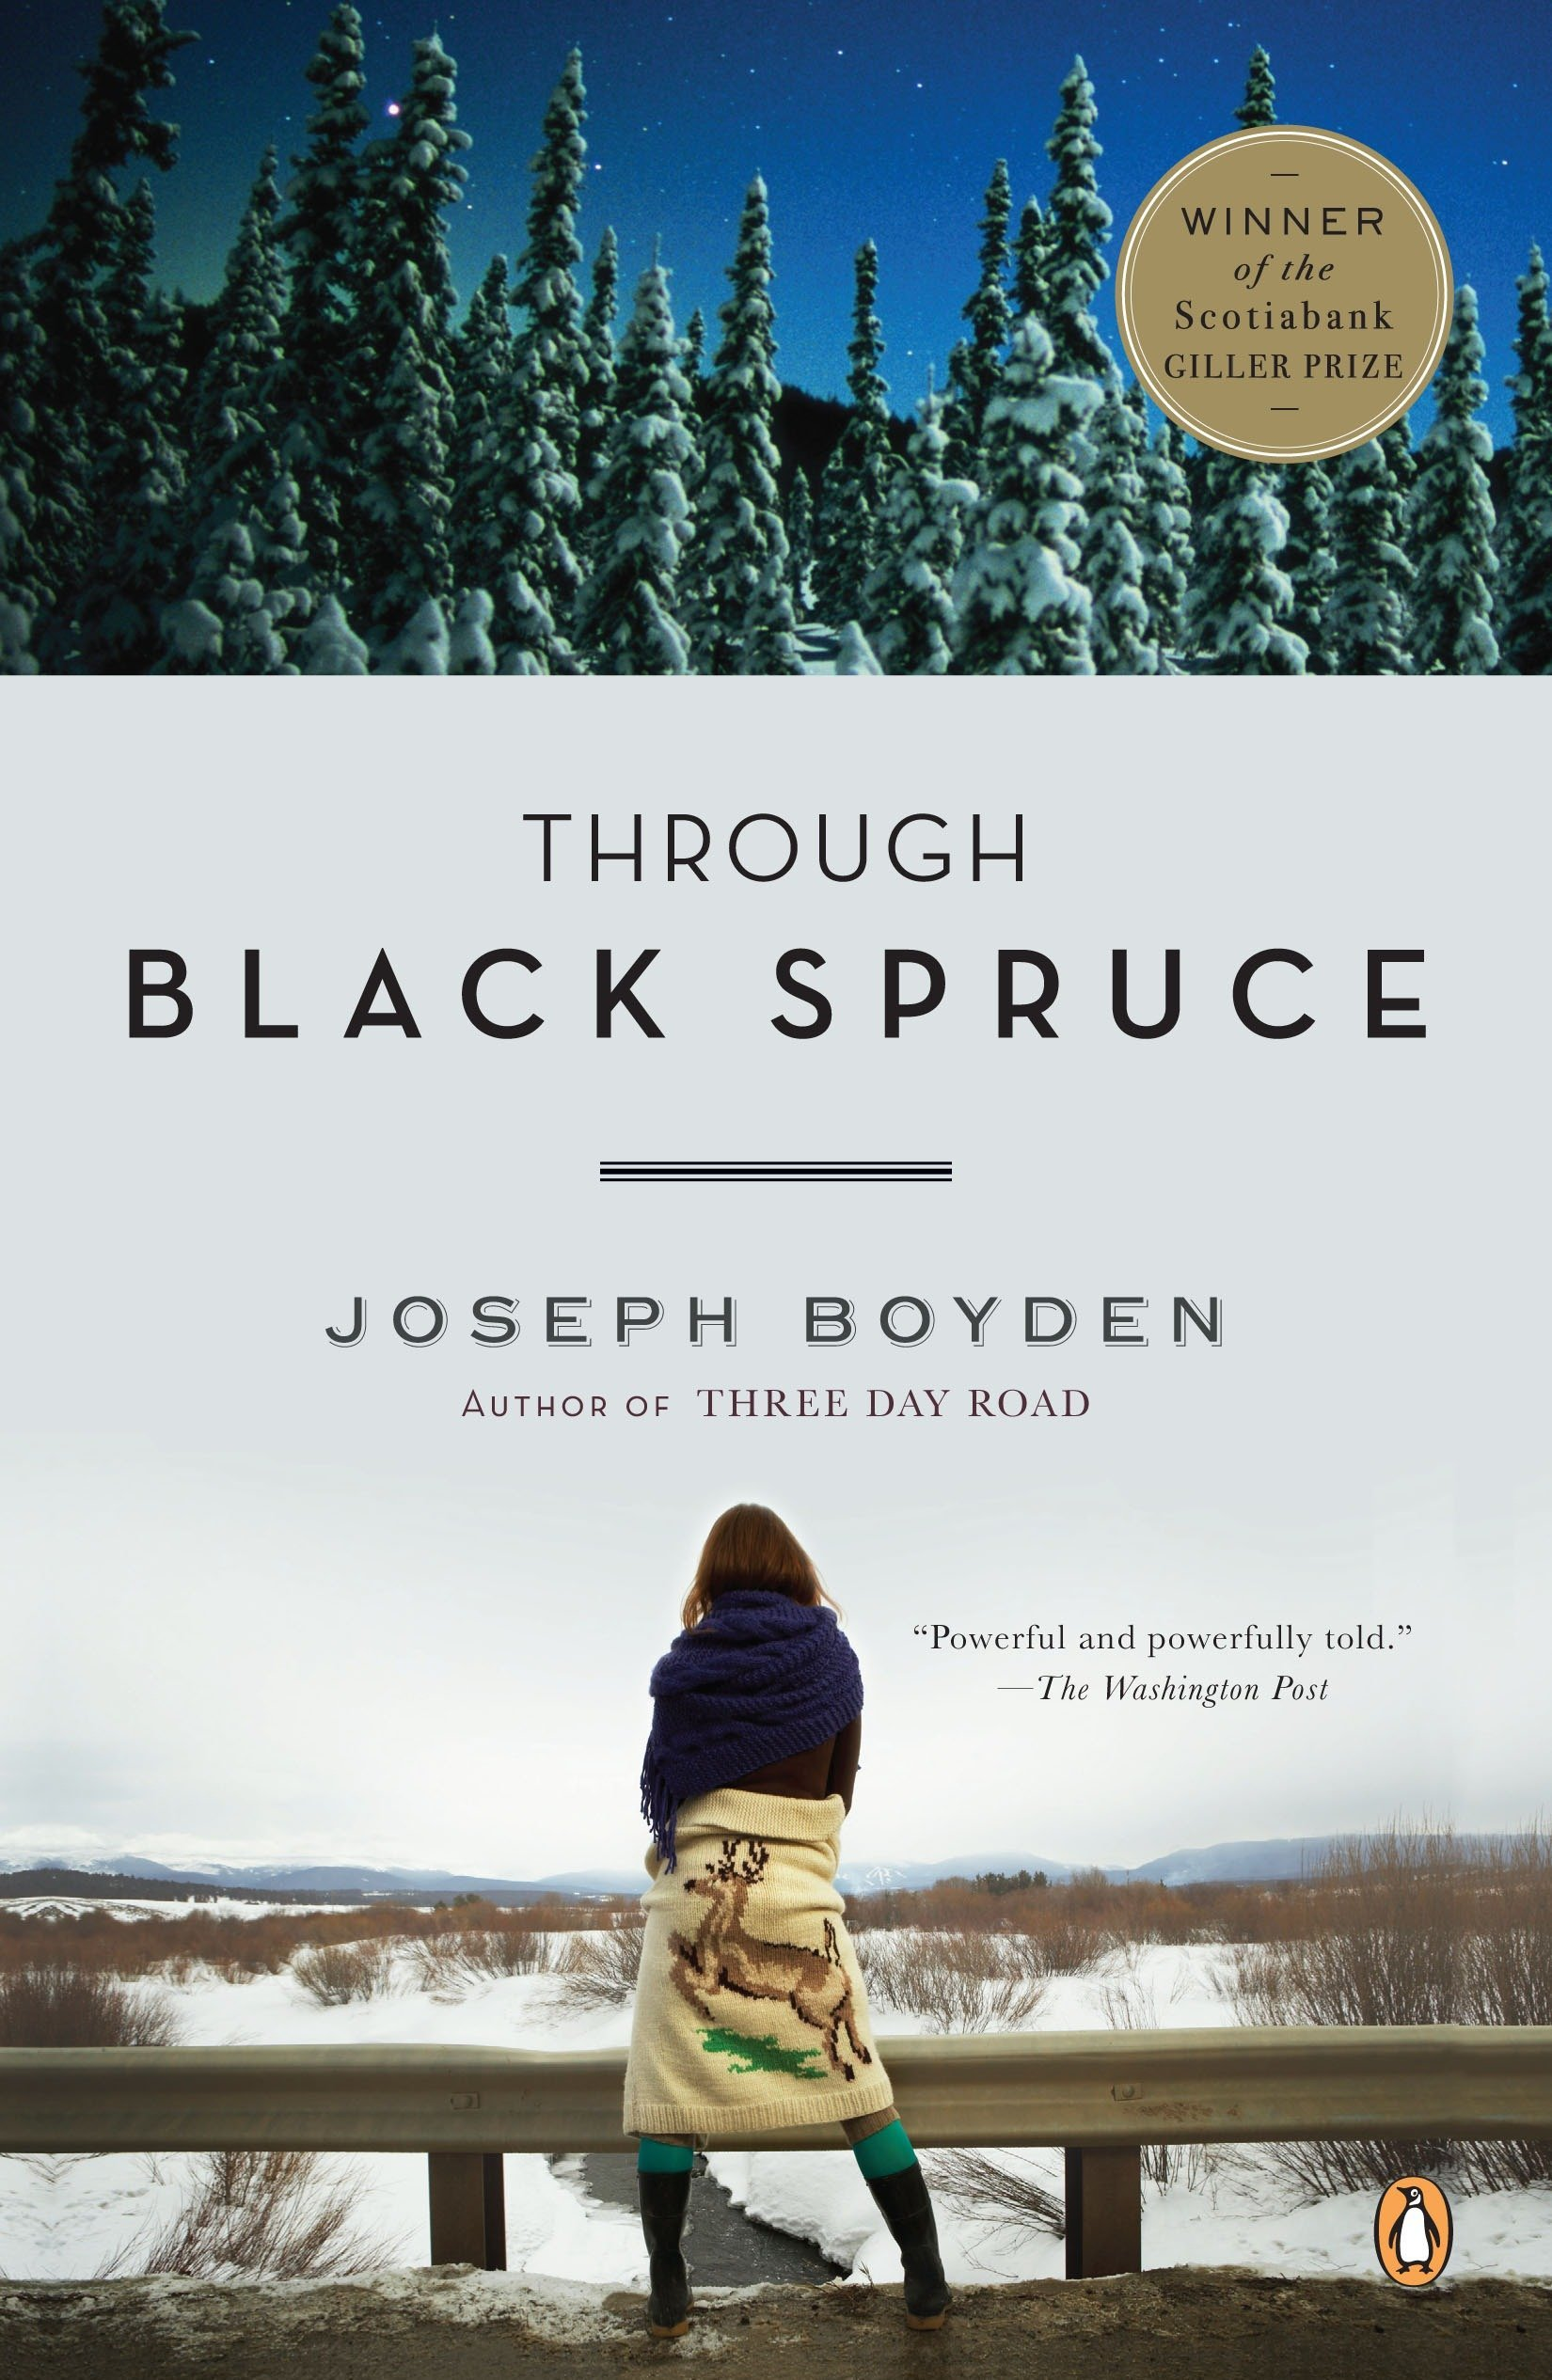 Amazon.com: Through Black Spruce: A Novel (9780143116509): Joseph Boyden:  Books